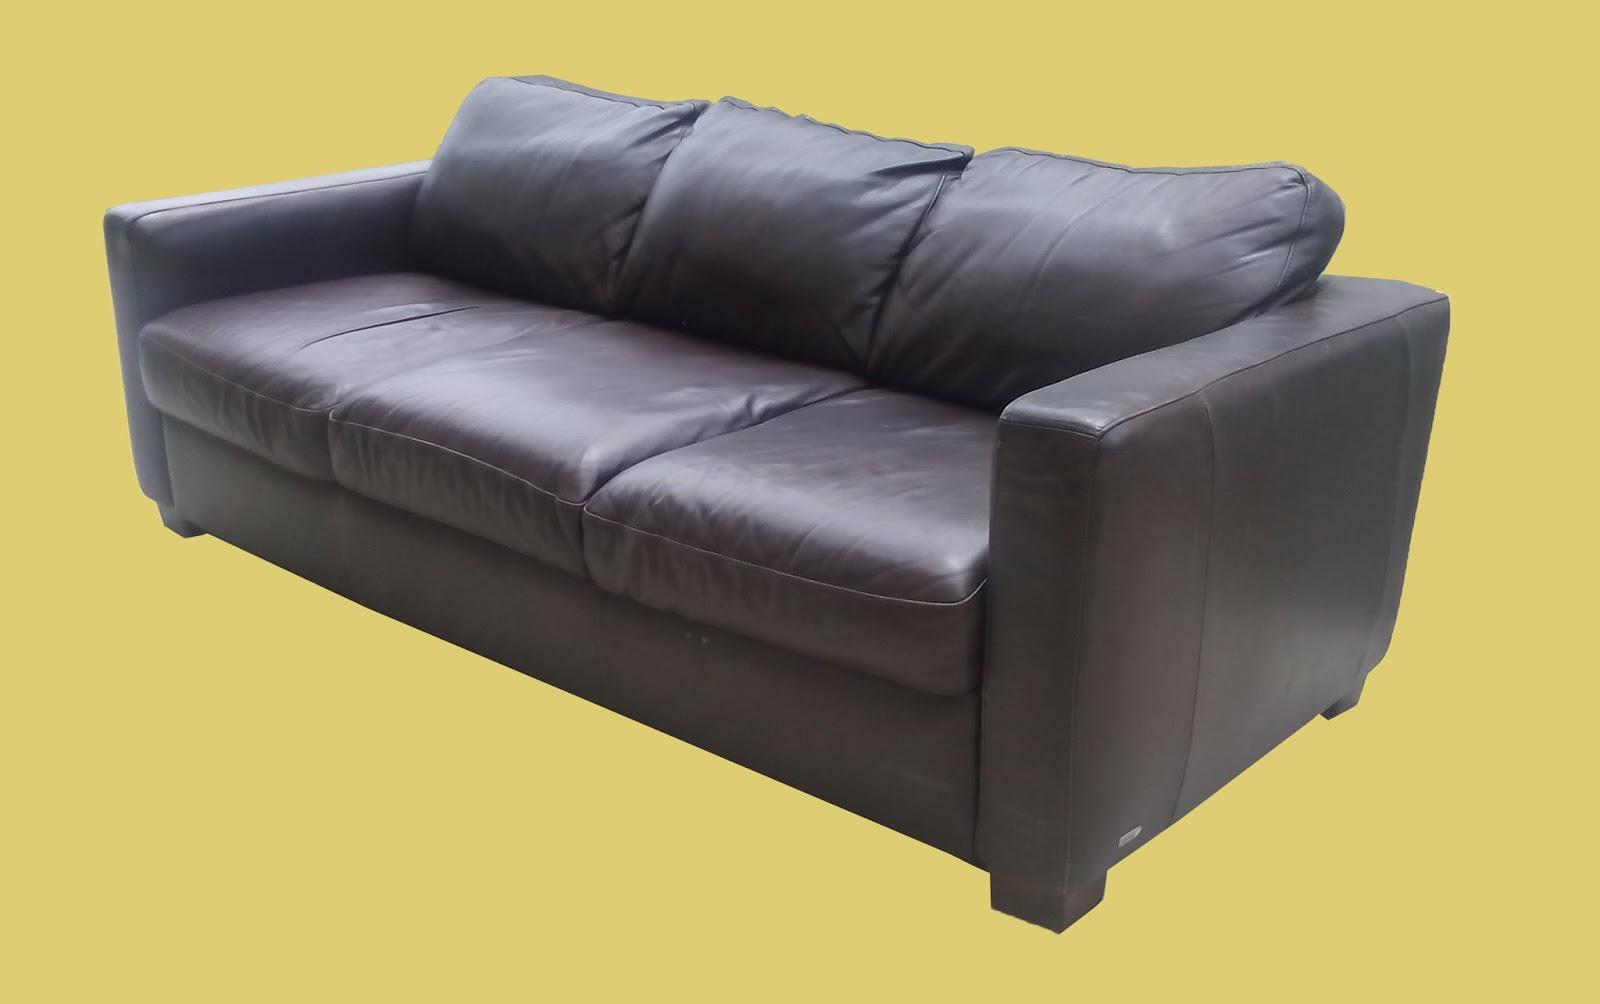 Italsofa Leather Sofa Natuzzi Sofas Sectionals